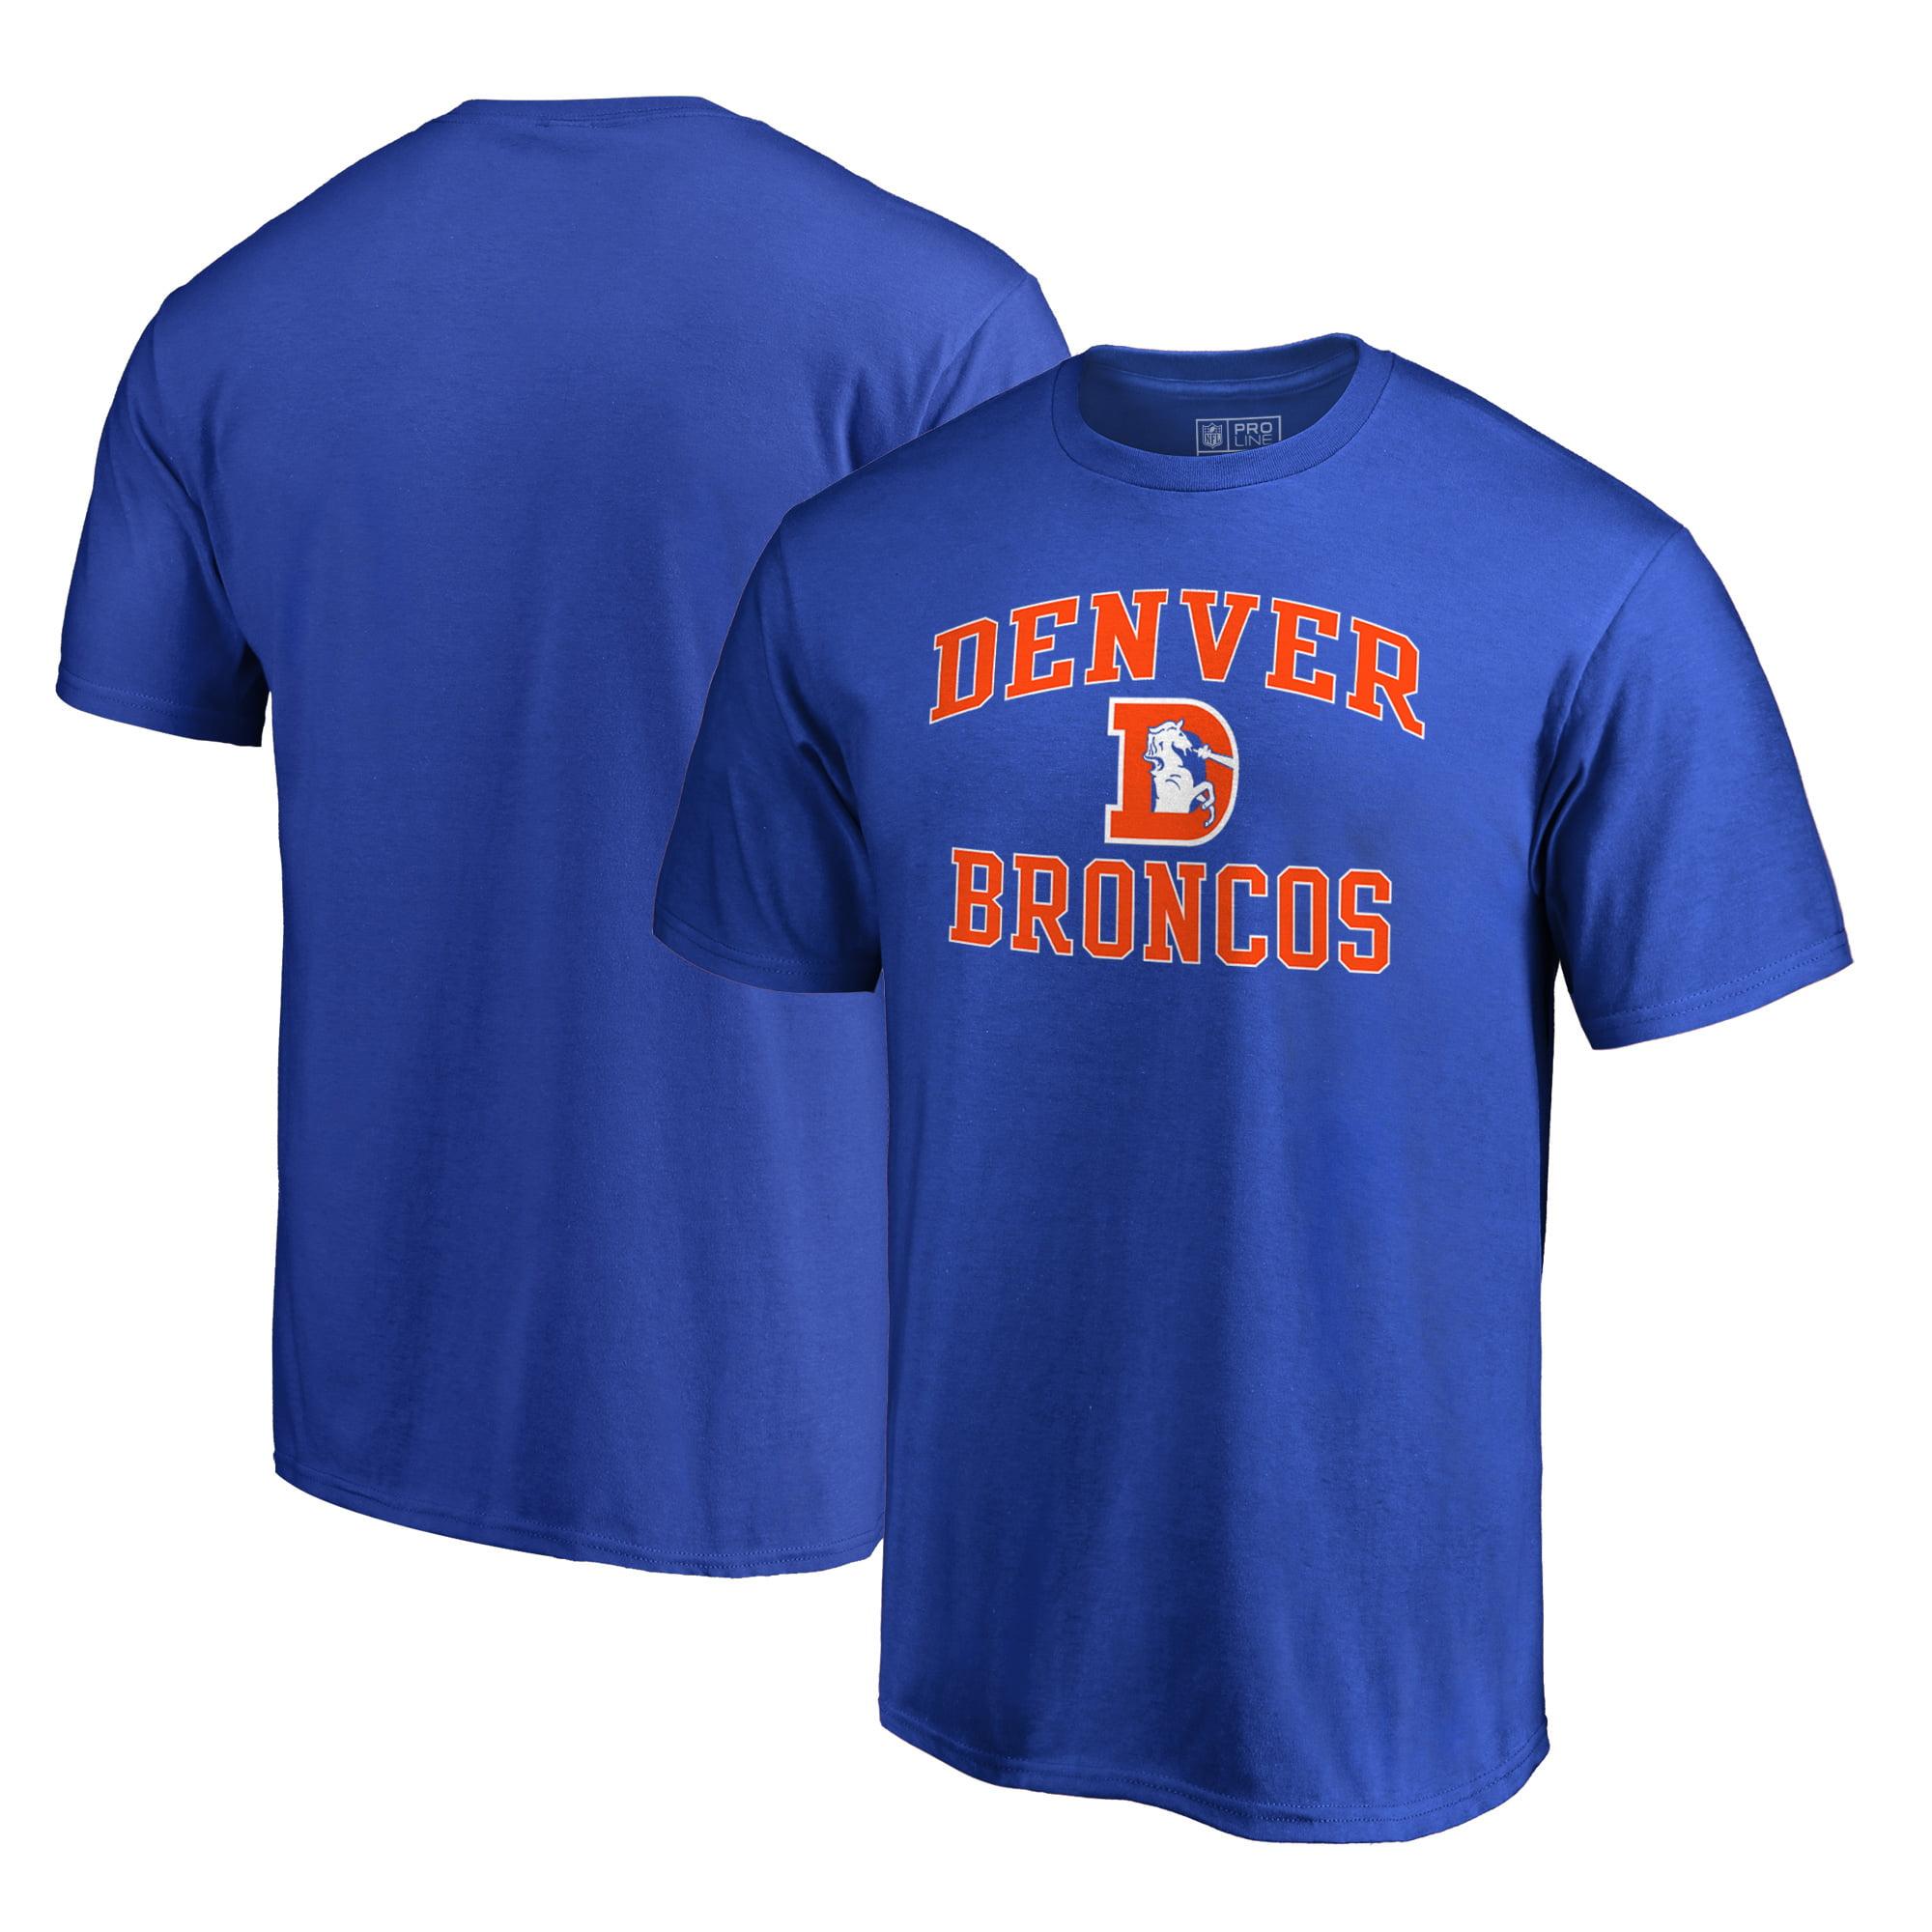 Denver Broncos NFL Pro Line by Fanatics Branded Vintage Victory Arch T-Shirt - Royal